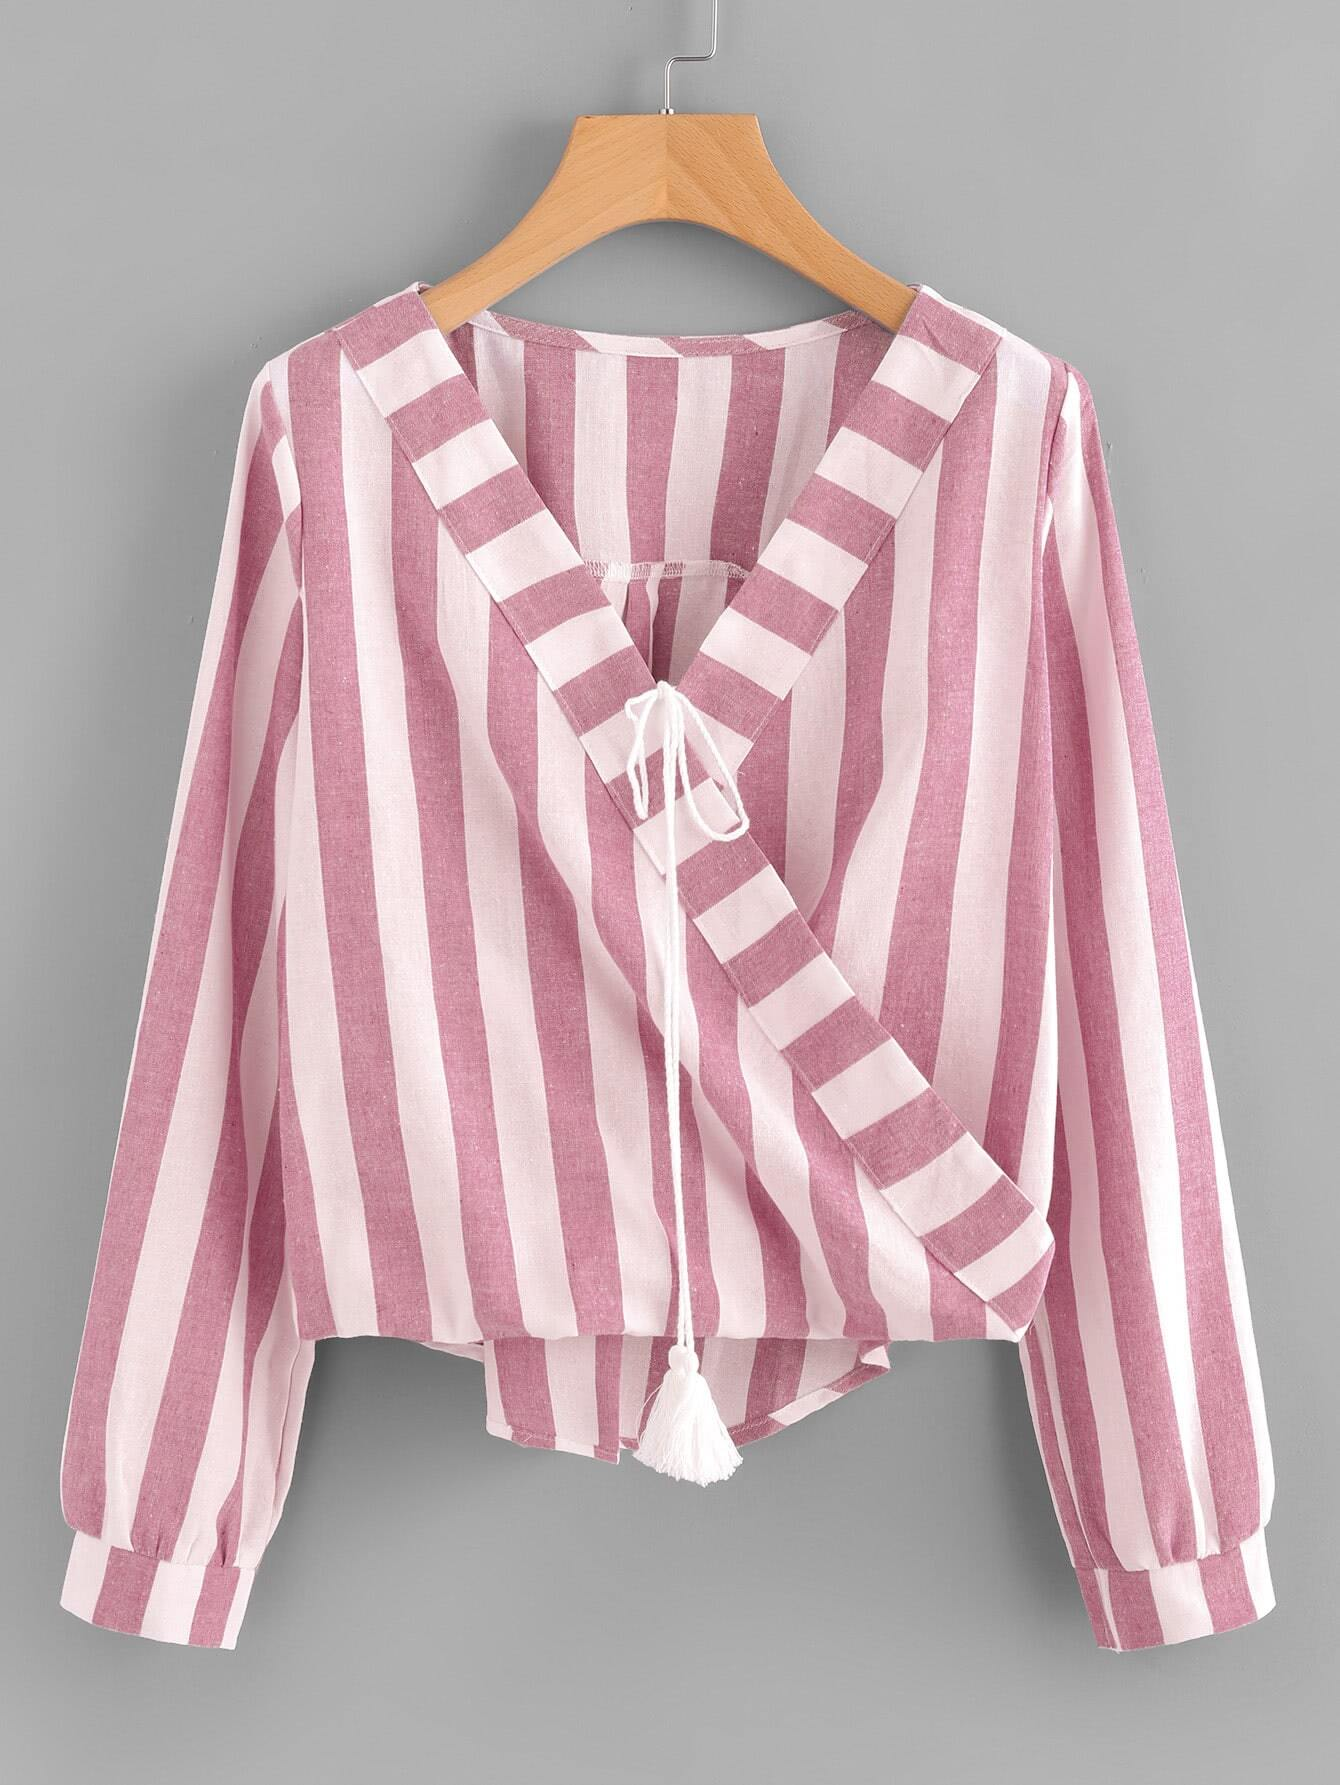 Contrast Striped Surplice Neckline Tassel Tie Blouse crisscross surplice neckline tie detail tropical print blouse